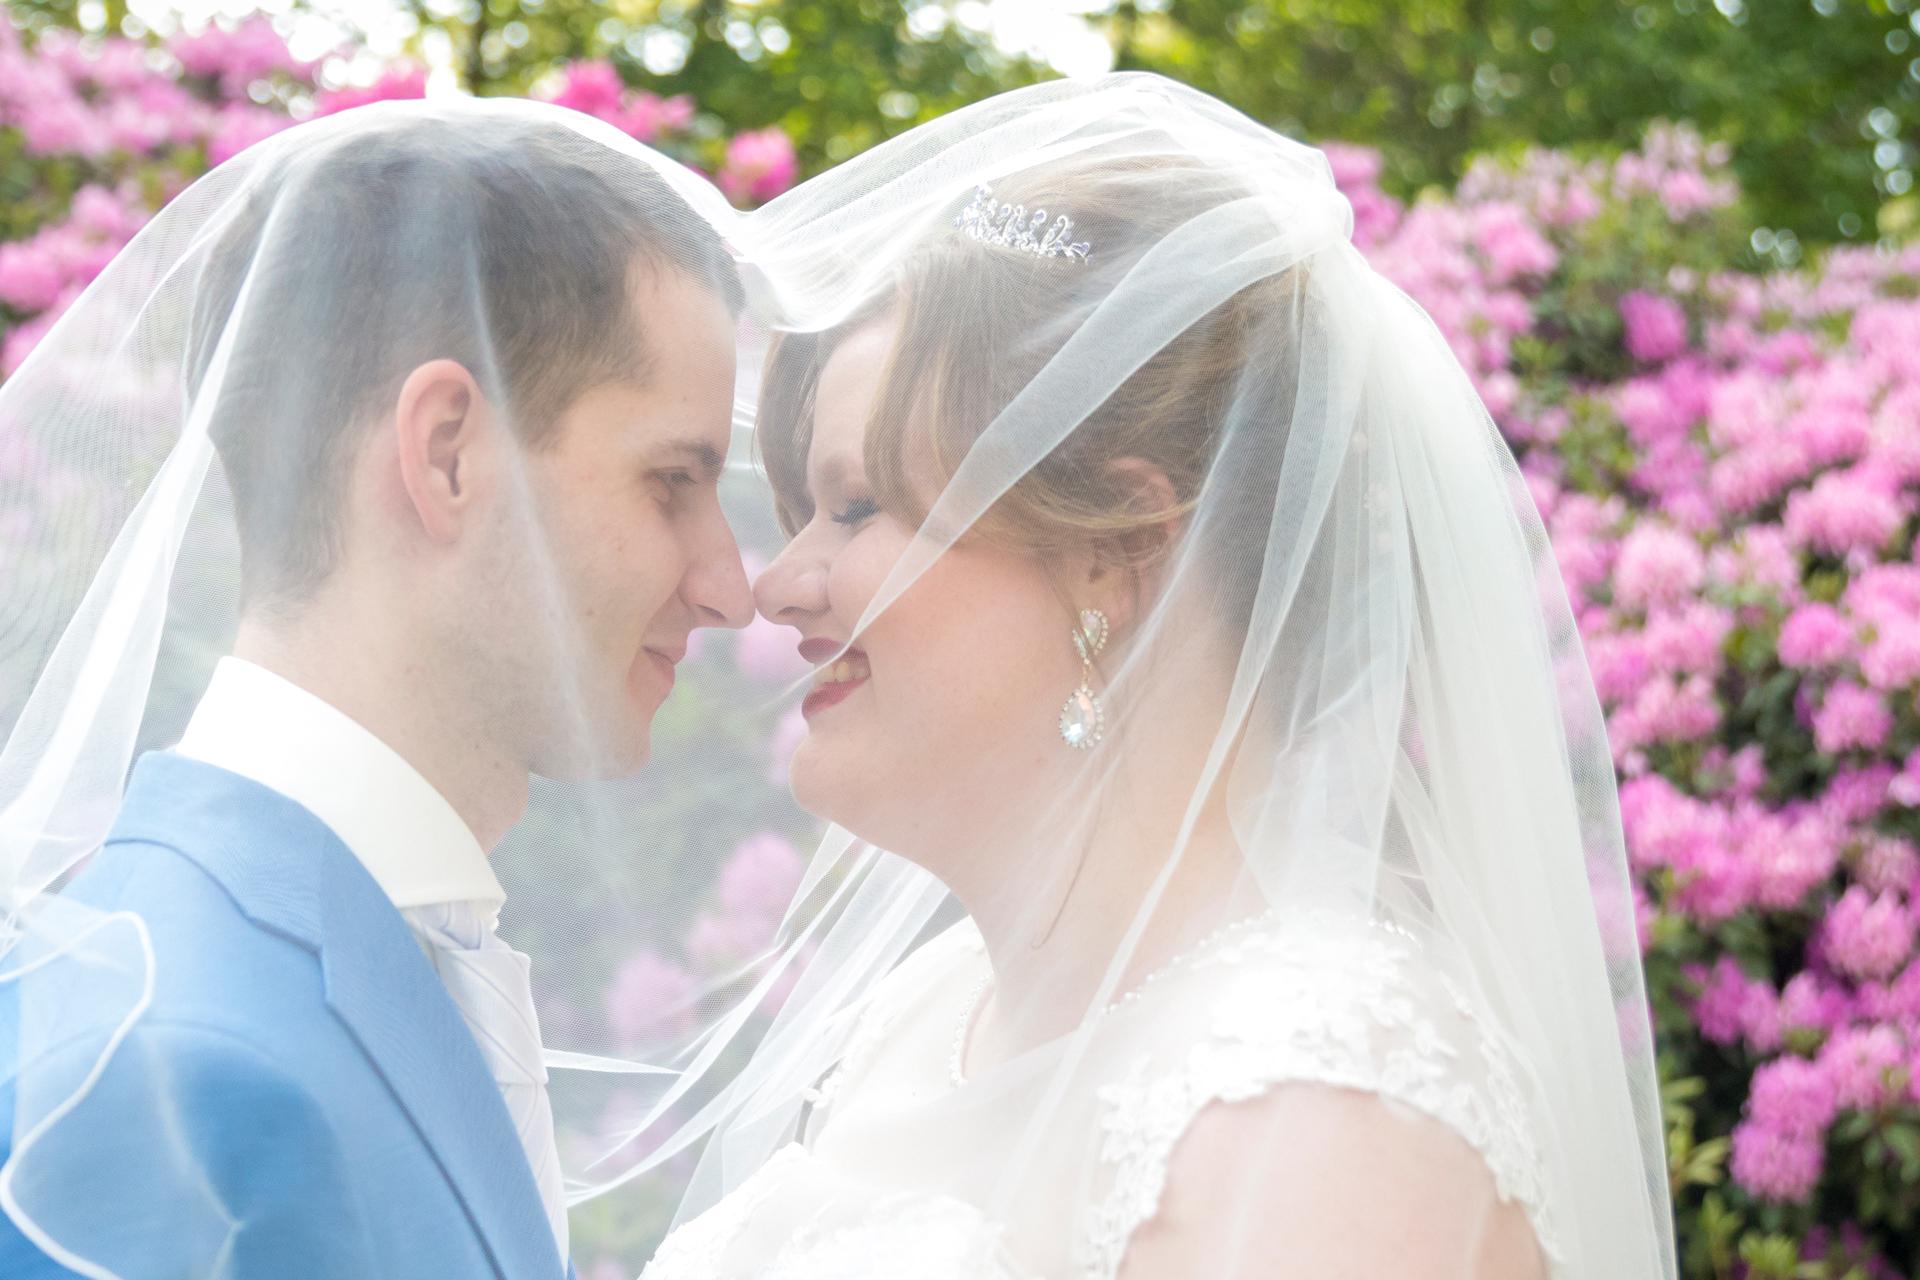 peggylaugsfotografie-trouwen-bruiloft